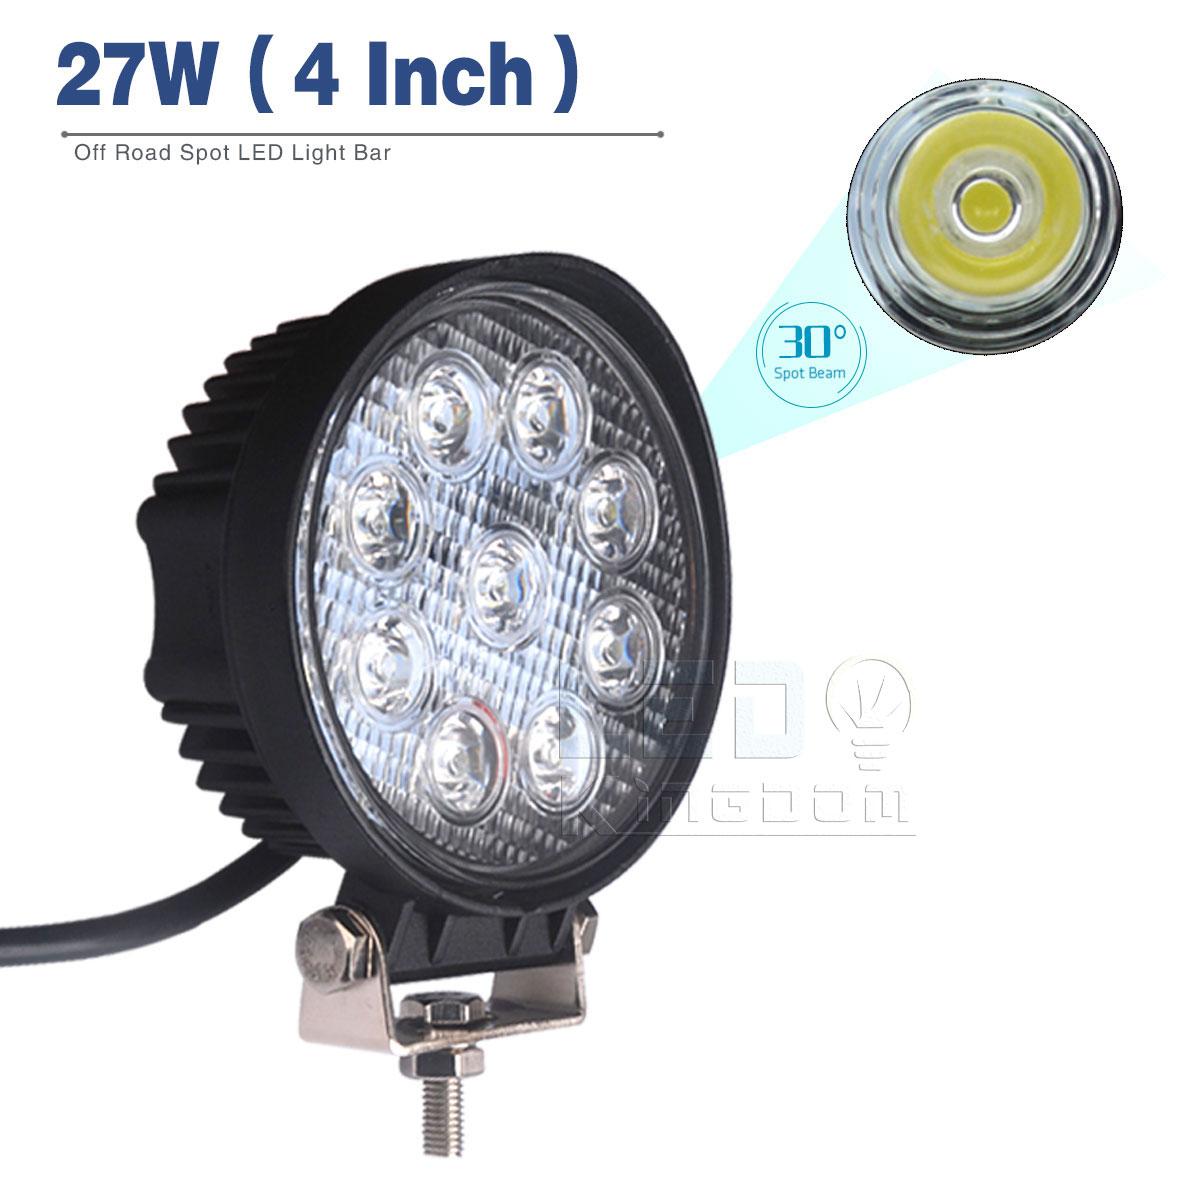 27w Led Work Light : Pcs quot w round led work light bar spot beam offroad